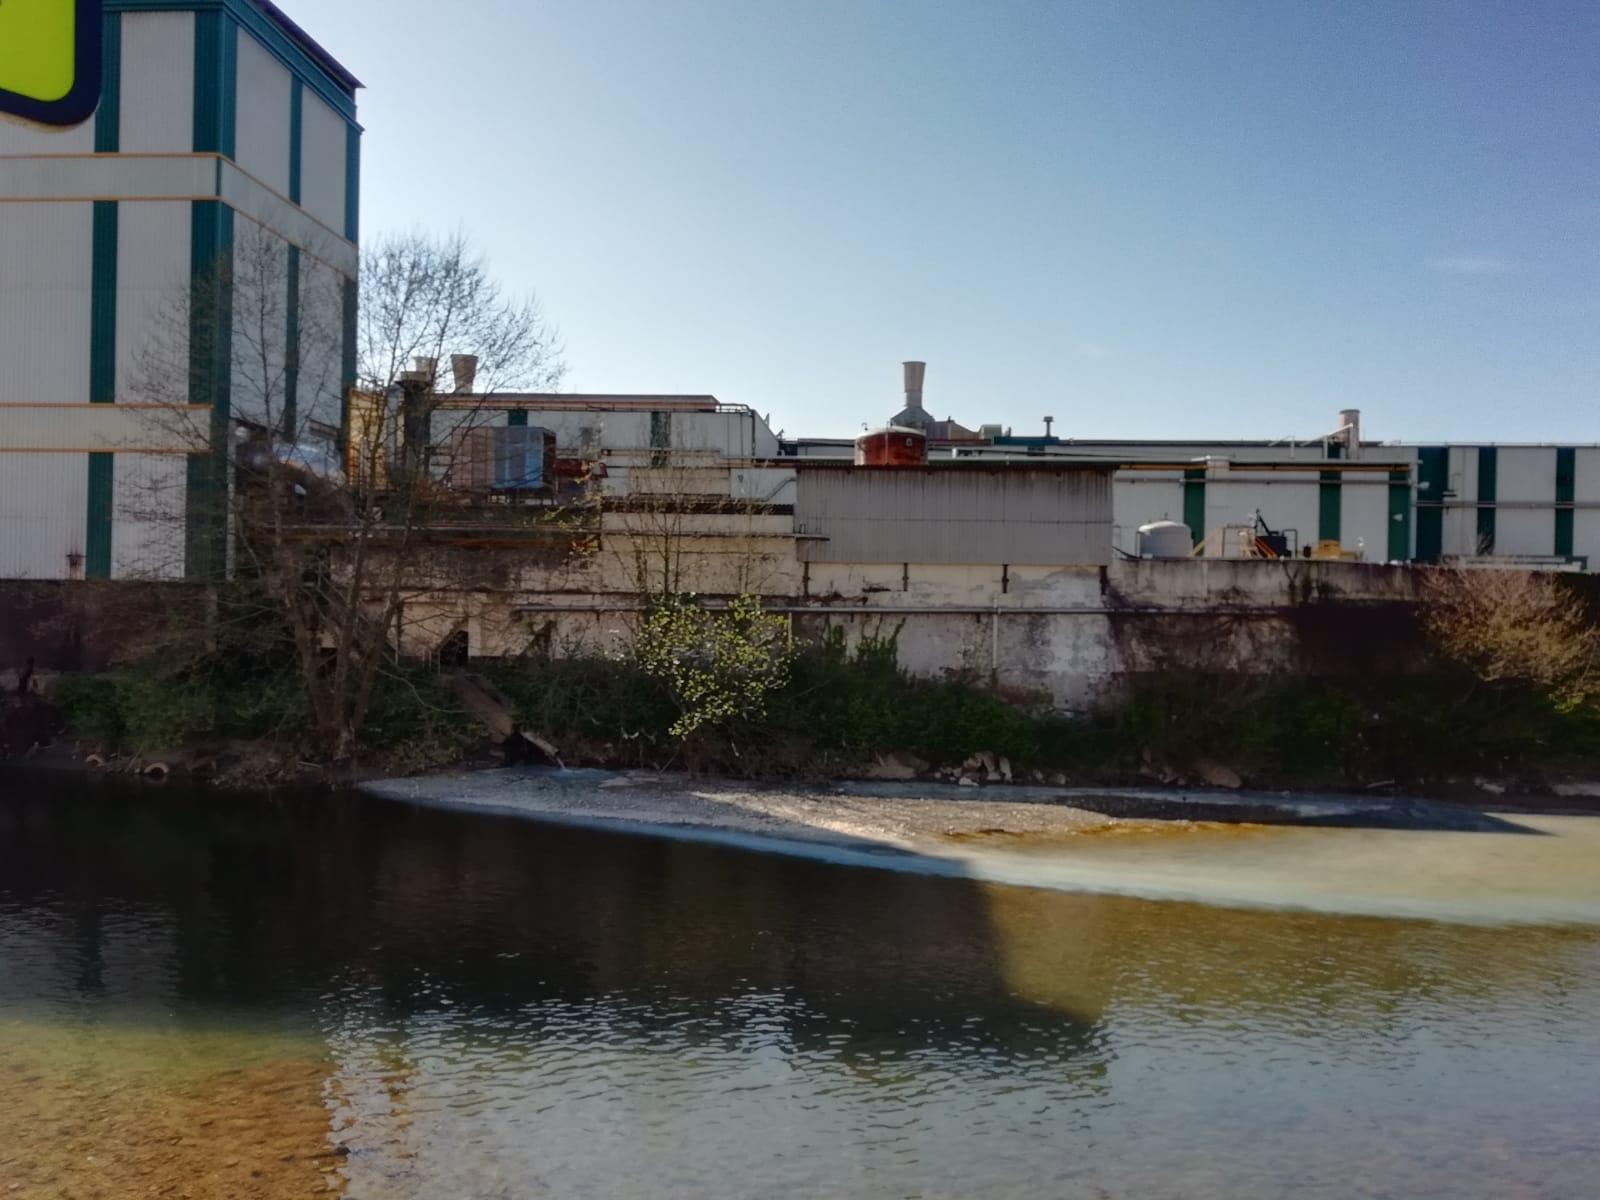 Oria paper fabrika isurketa 3 2019-03-29